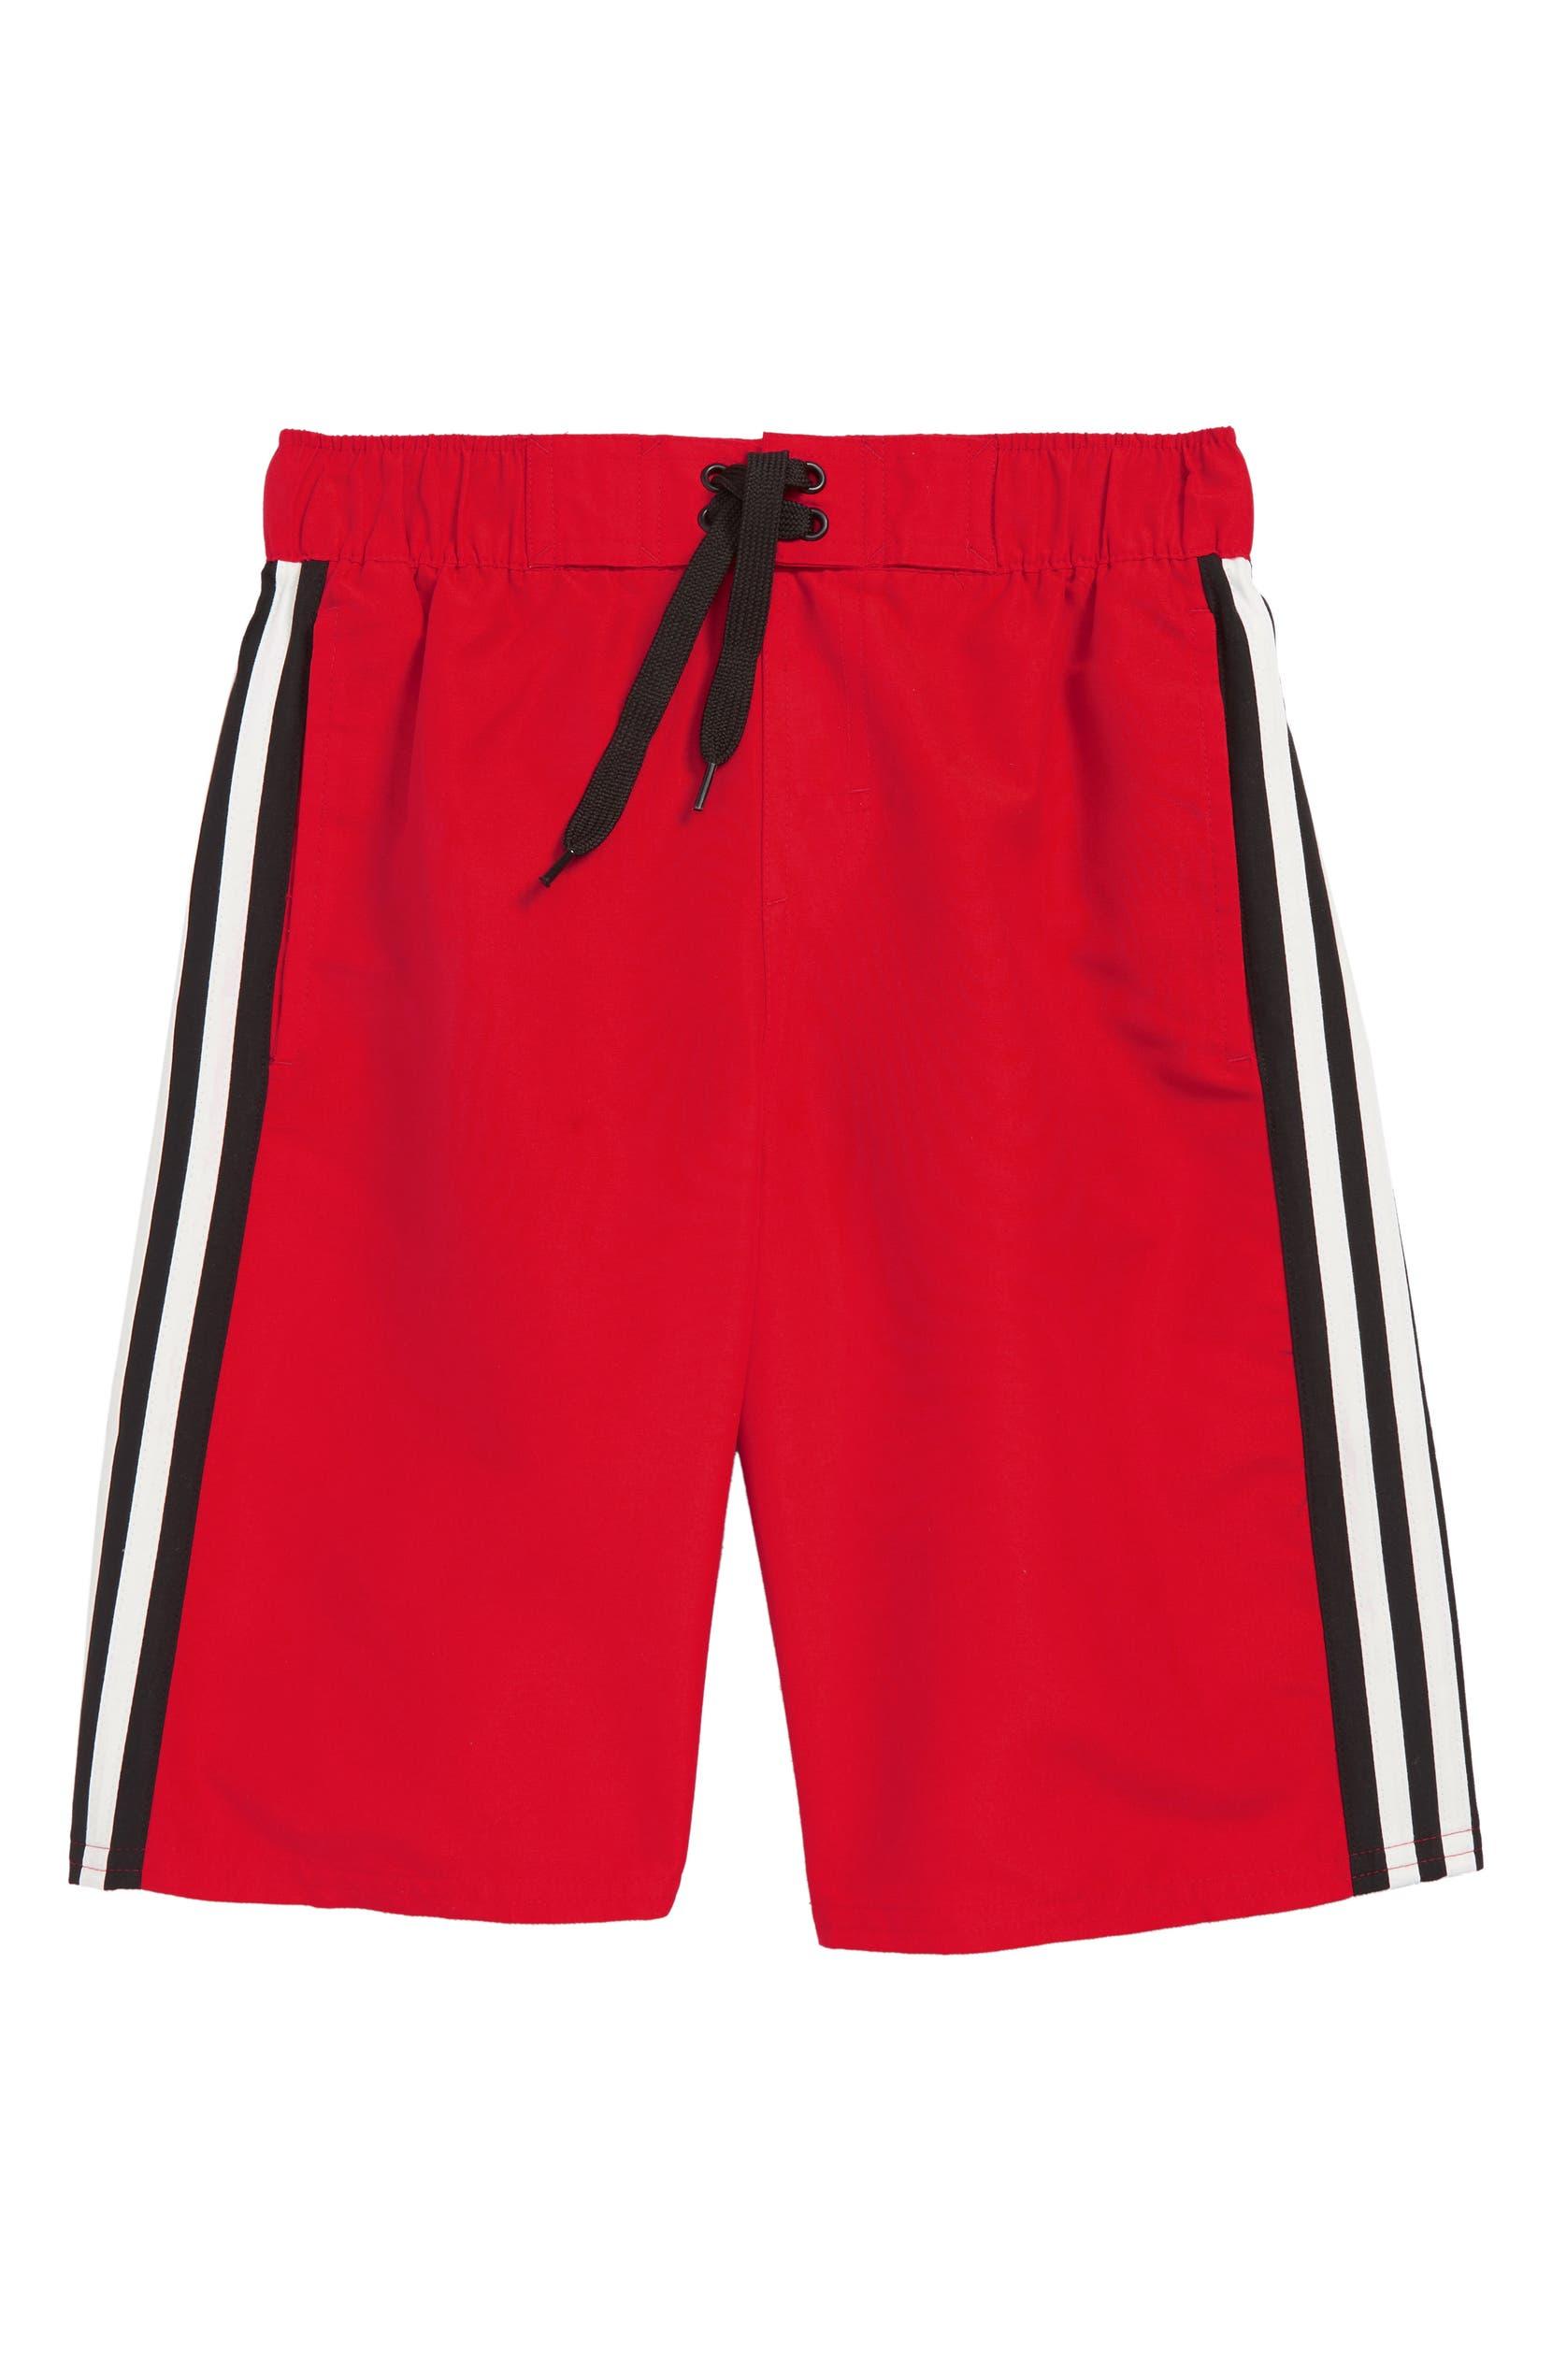 6d97989fb7 adidas Originals Iconic 3.0 Volley Swim Trunks (Big Boys)   Nordstrom